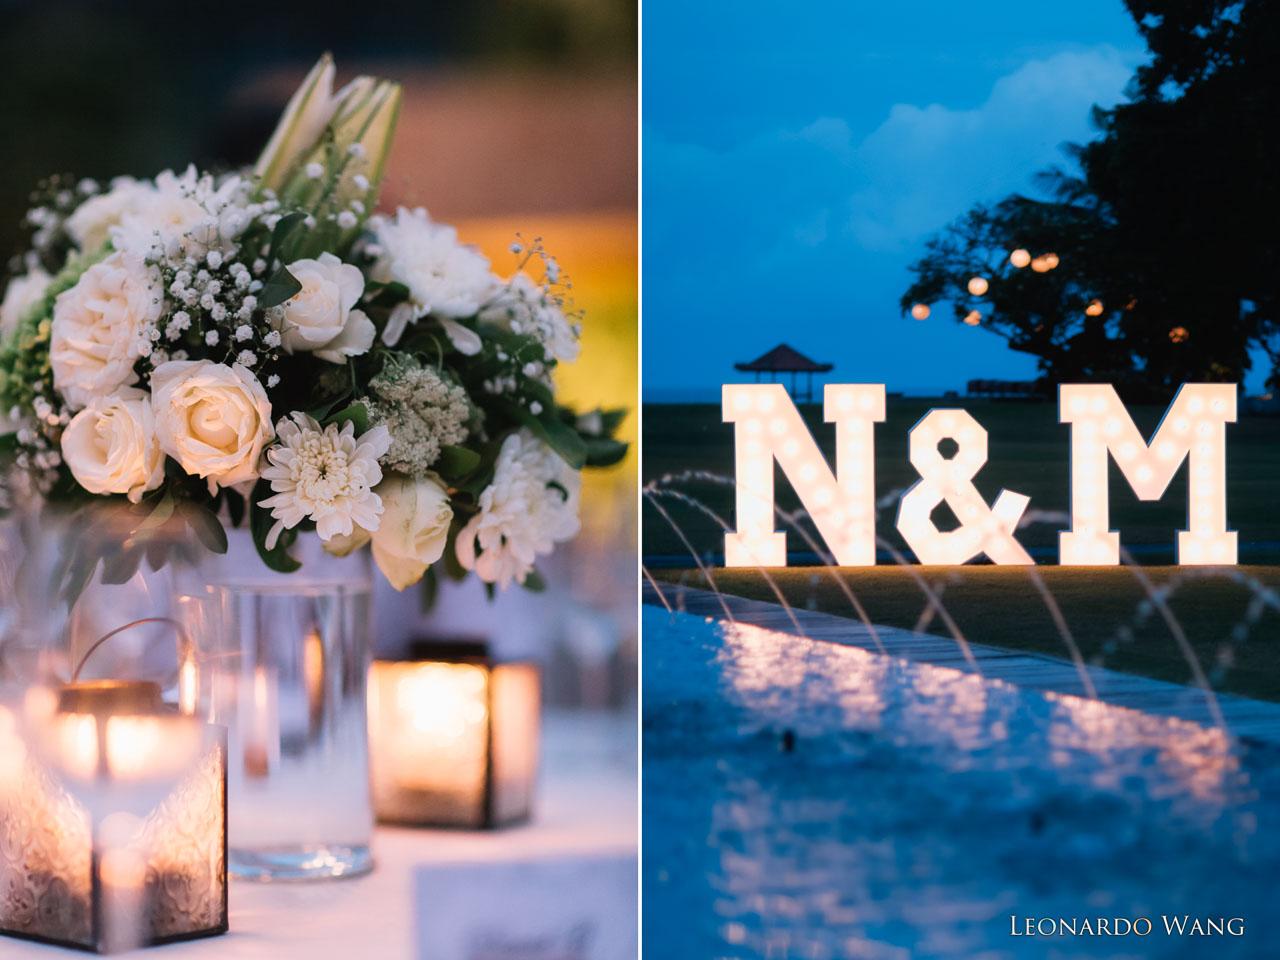 巴厘岛婚礼摄影Taman Bhagawan萨摩亚新人婚礼